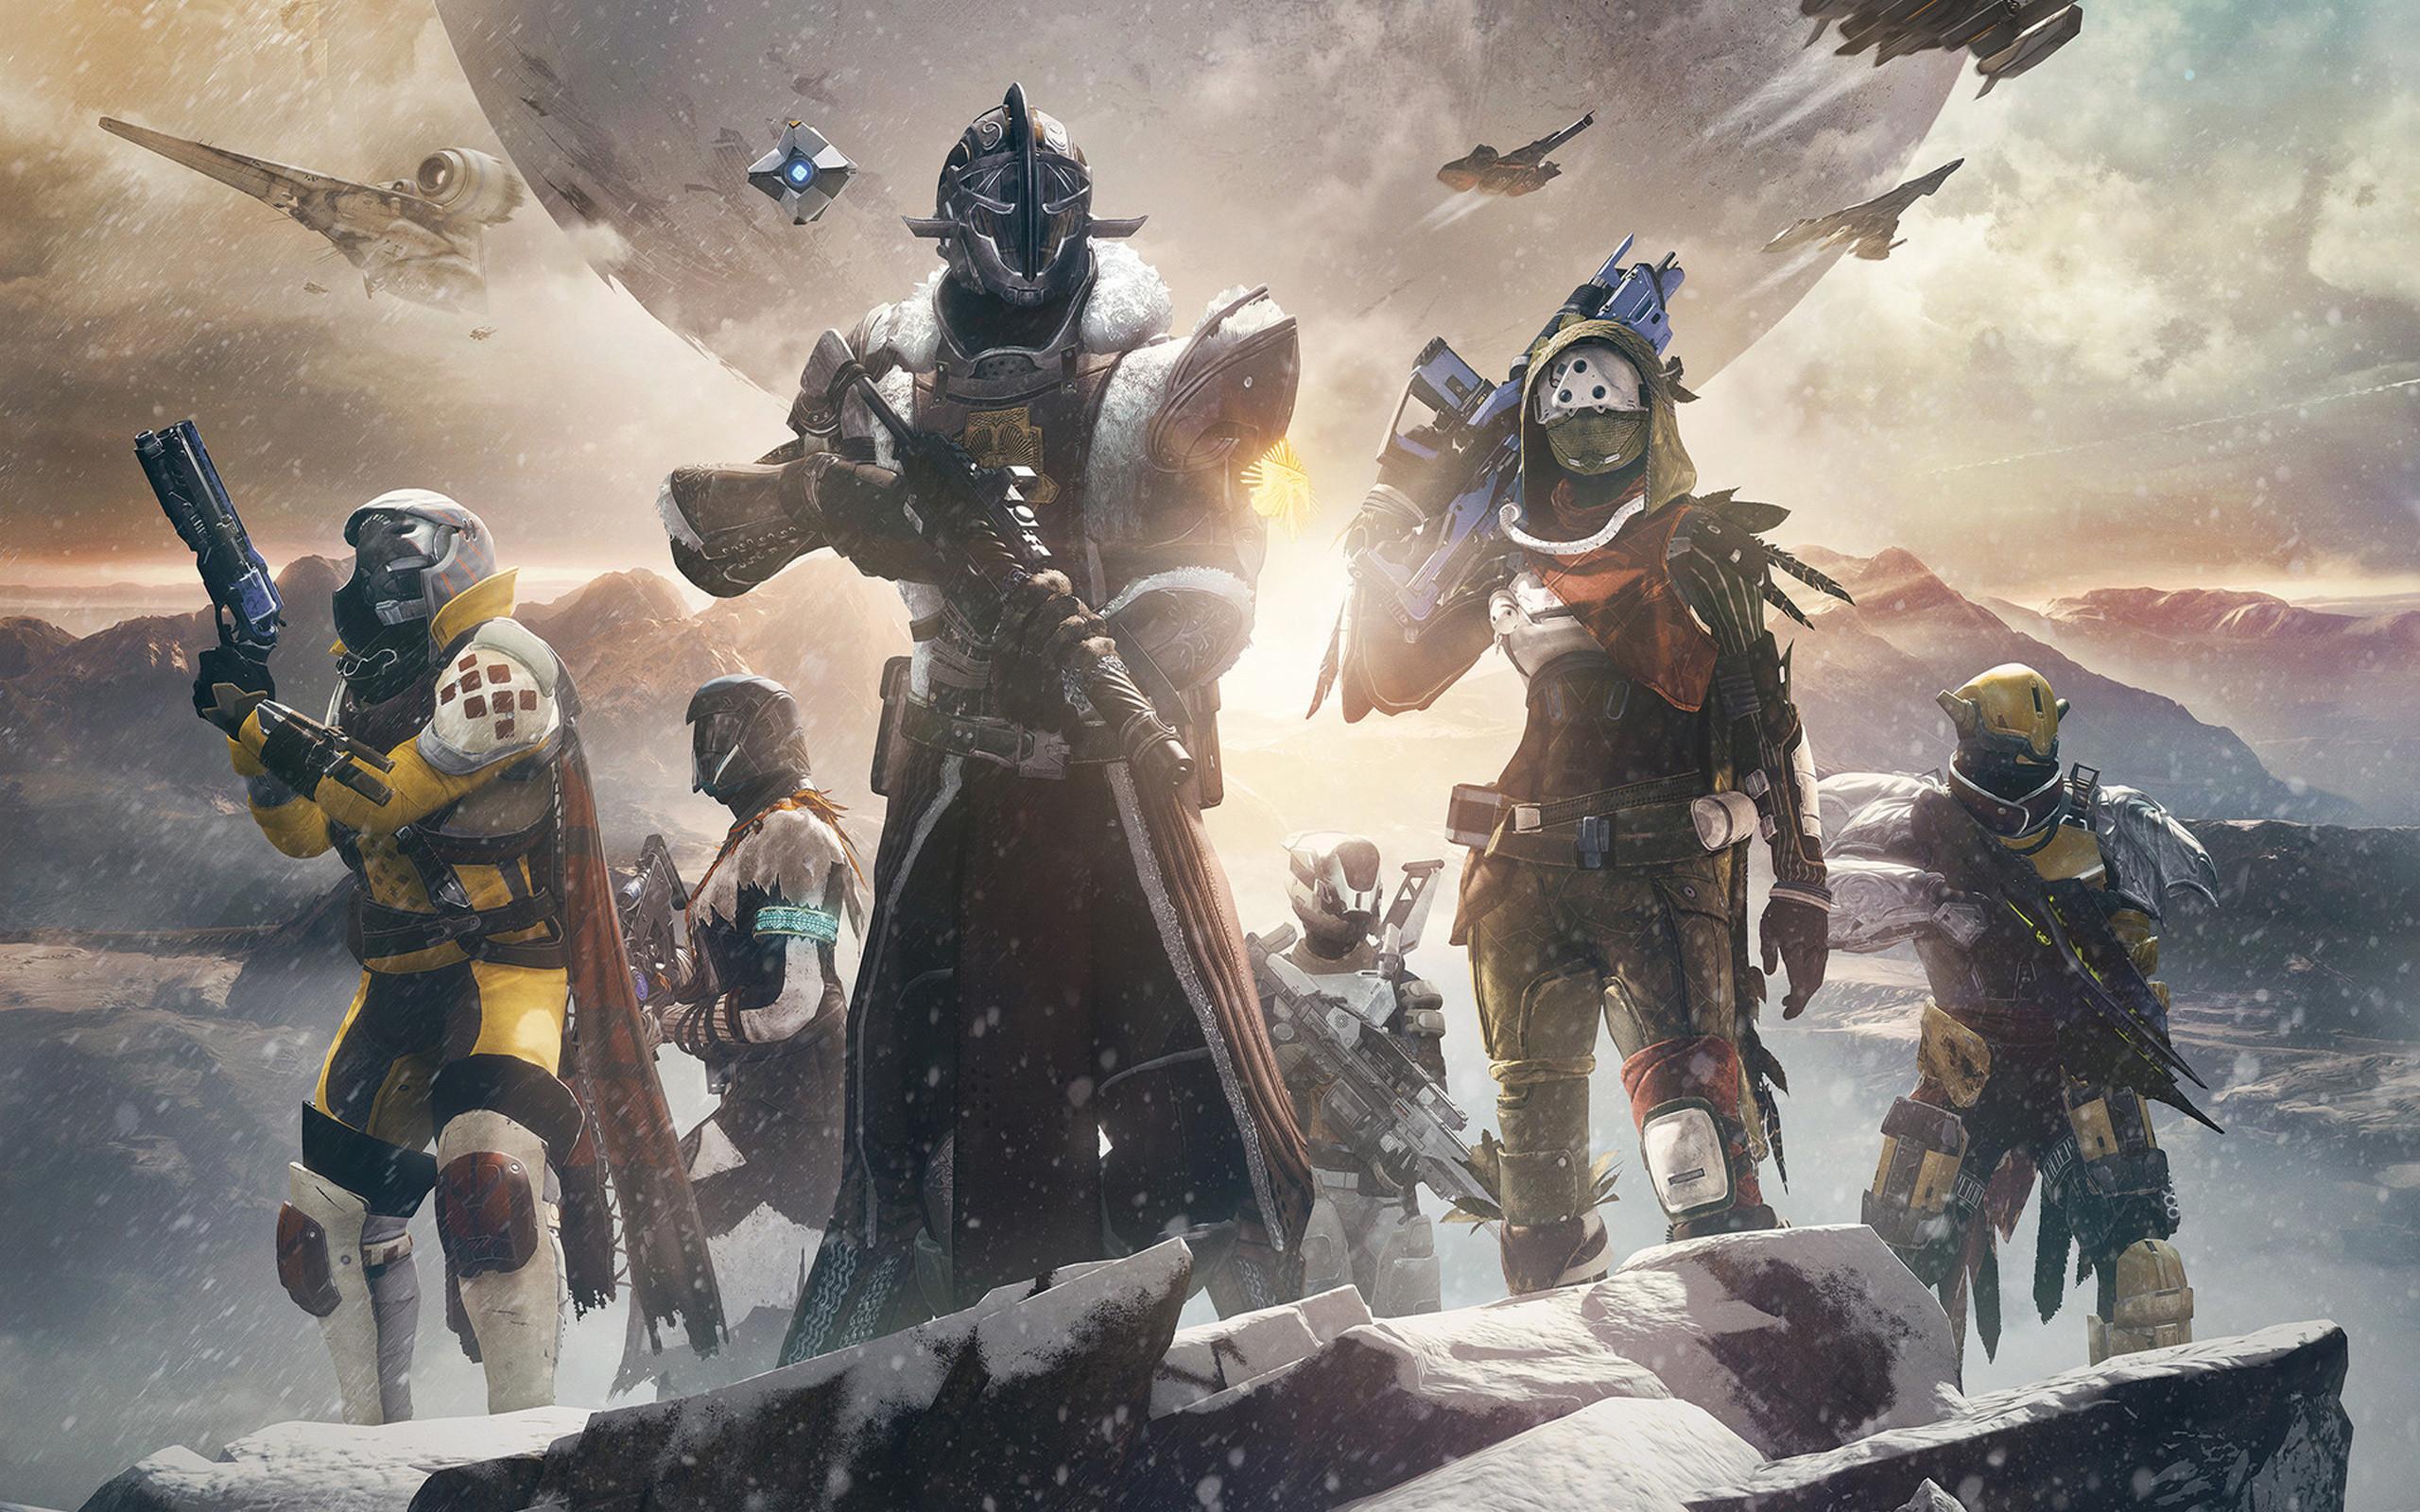 Res: 2560x1600, Tags: Destiny ...